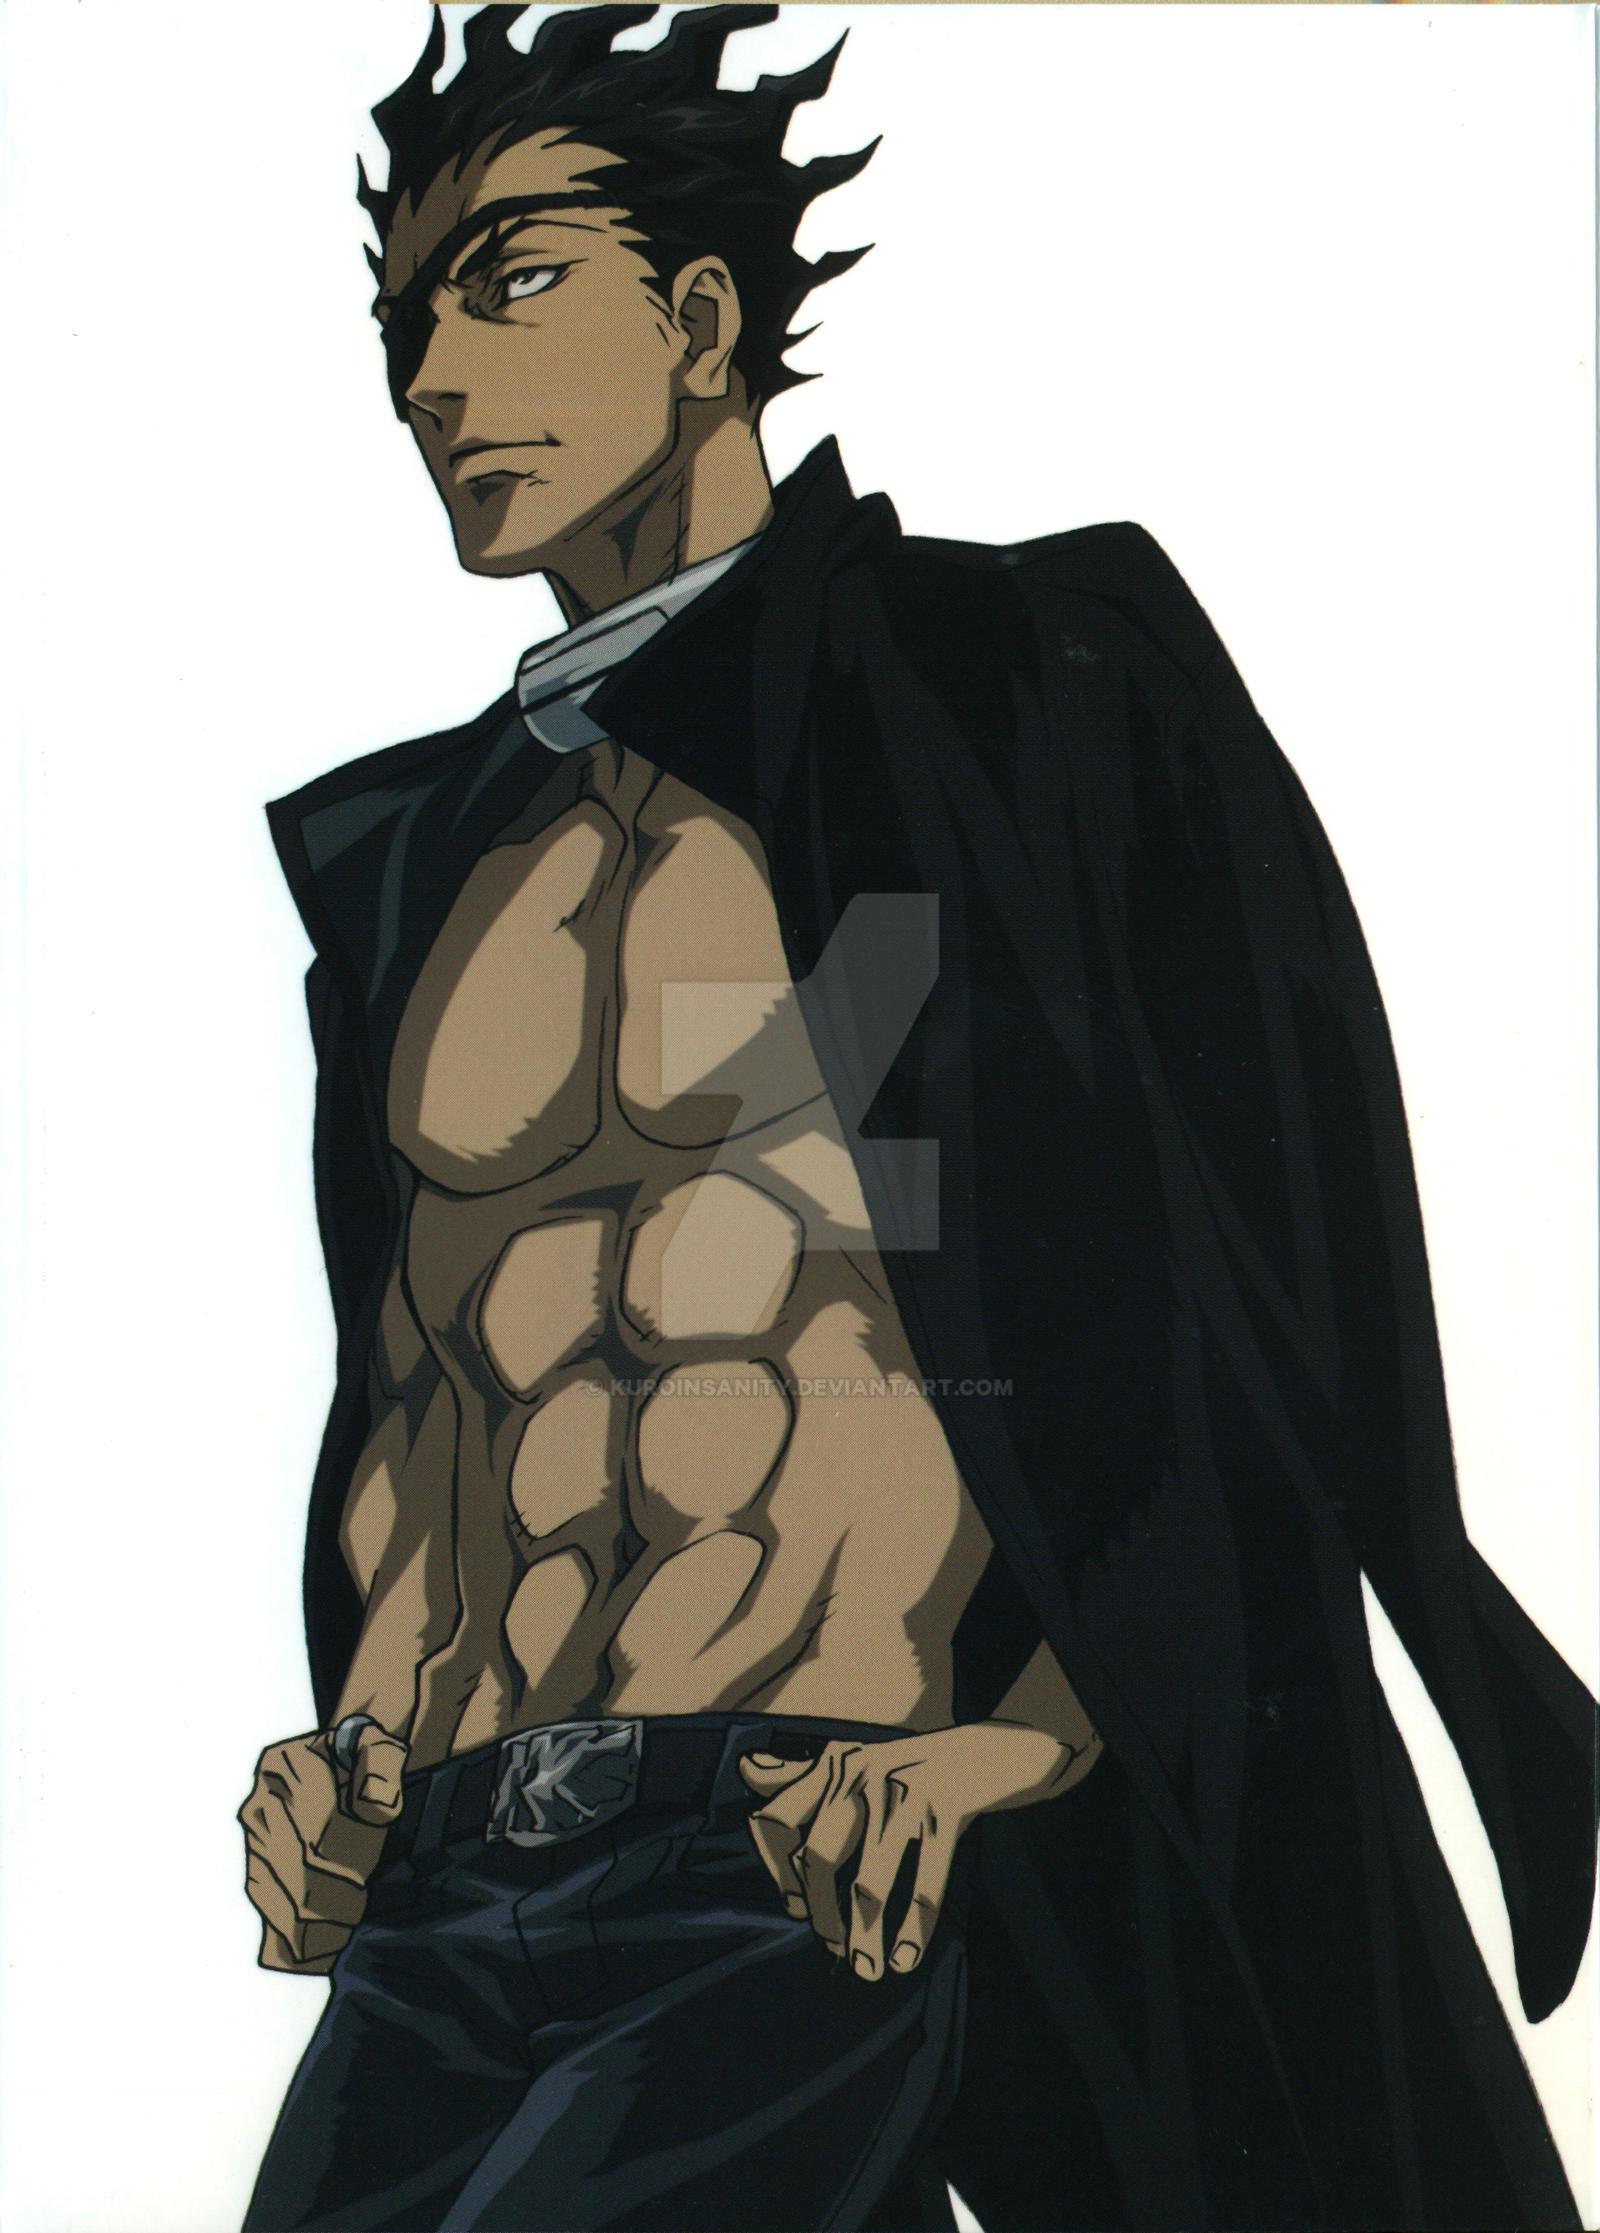 senji kiyomasa by kuroinsanity d788tub 15 Handsome Male Anime Characters with Tattoos